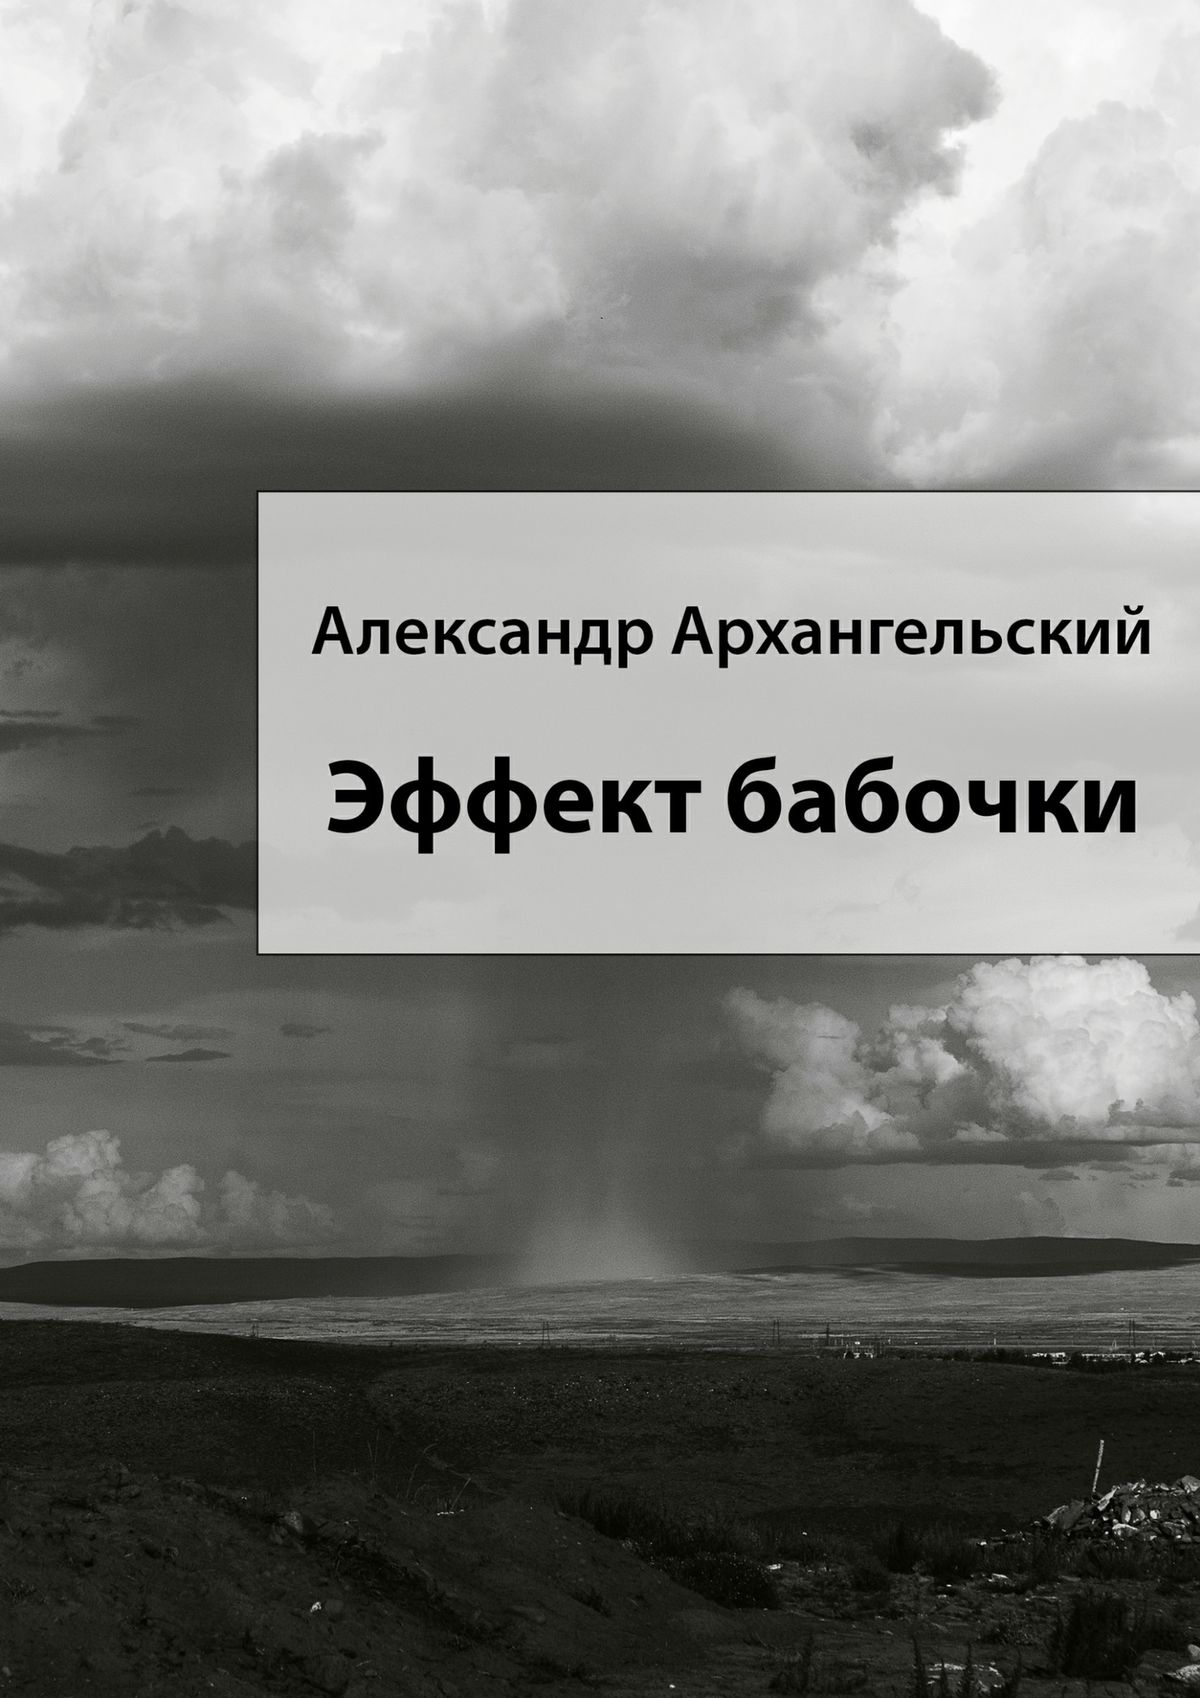 Александр Архангельский Эффект бабочки